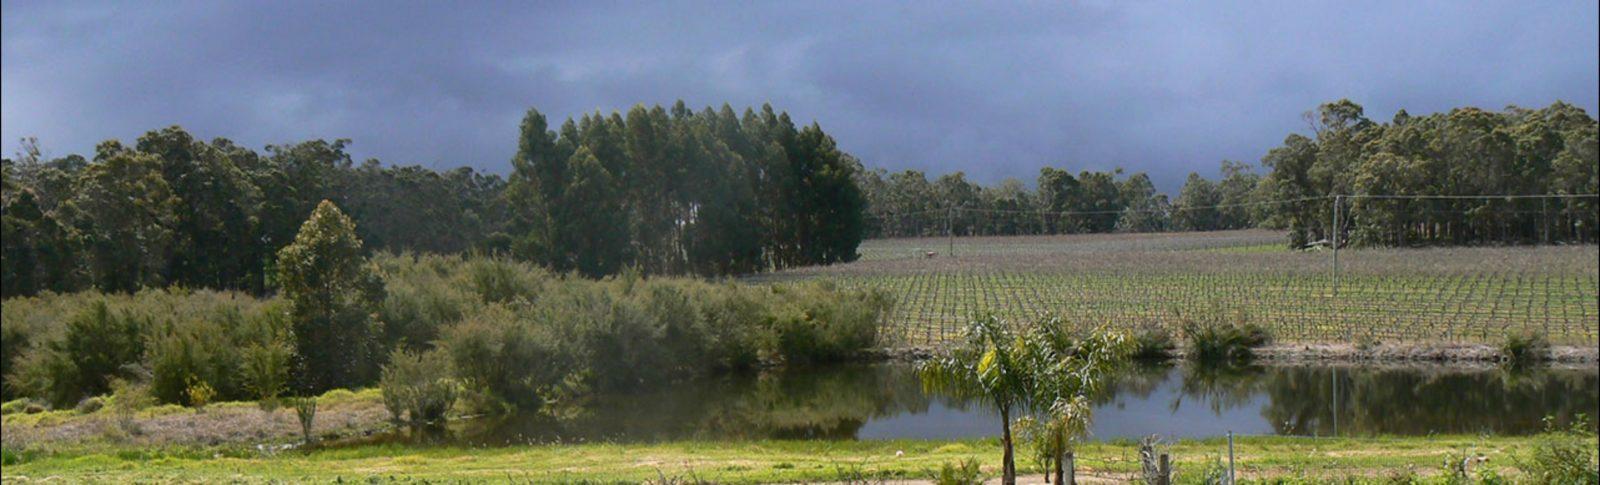 Alchemists Wines, Cowaramup, Western Australia